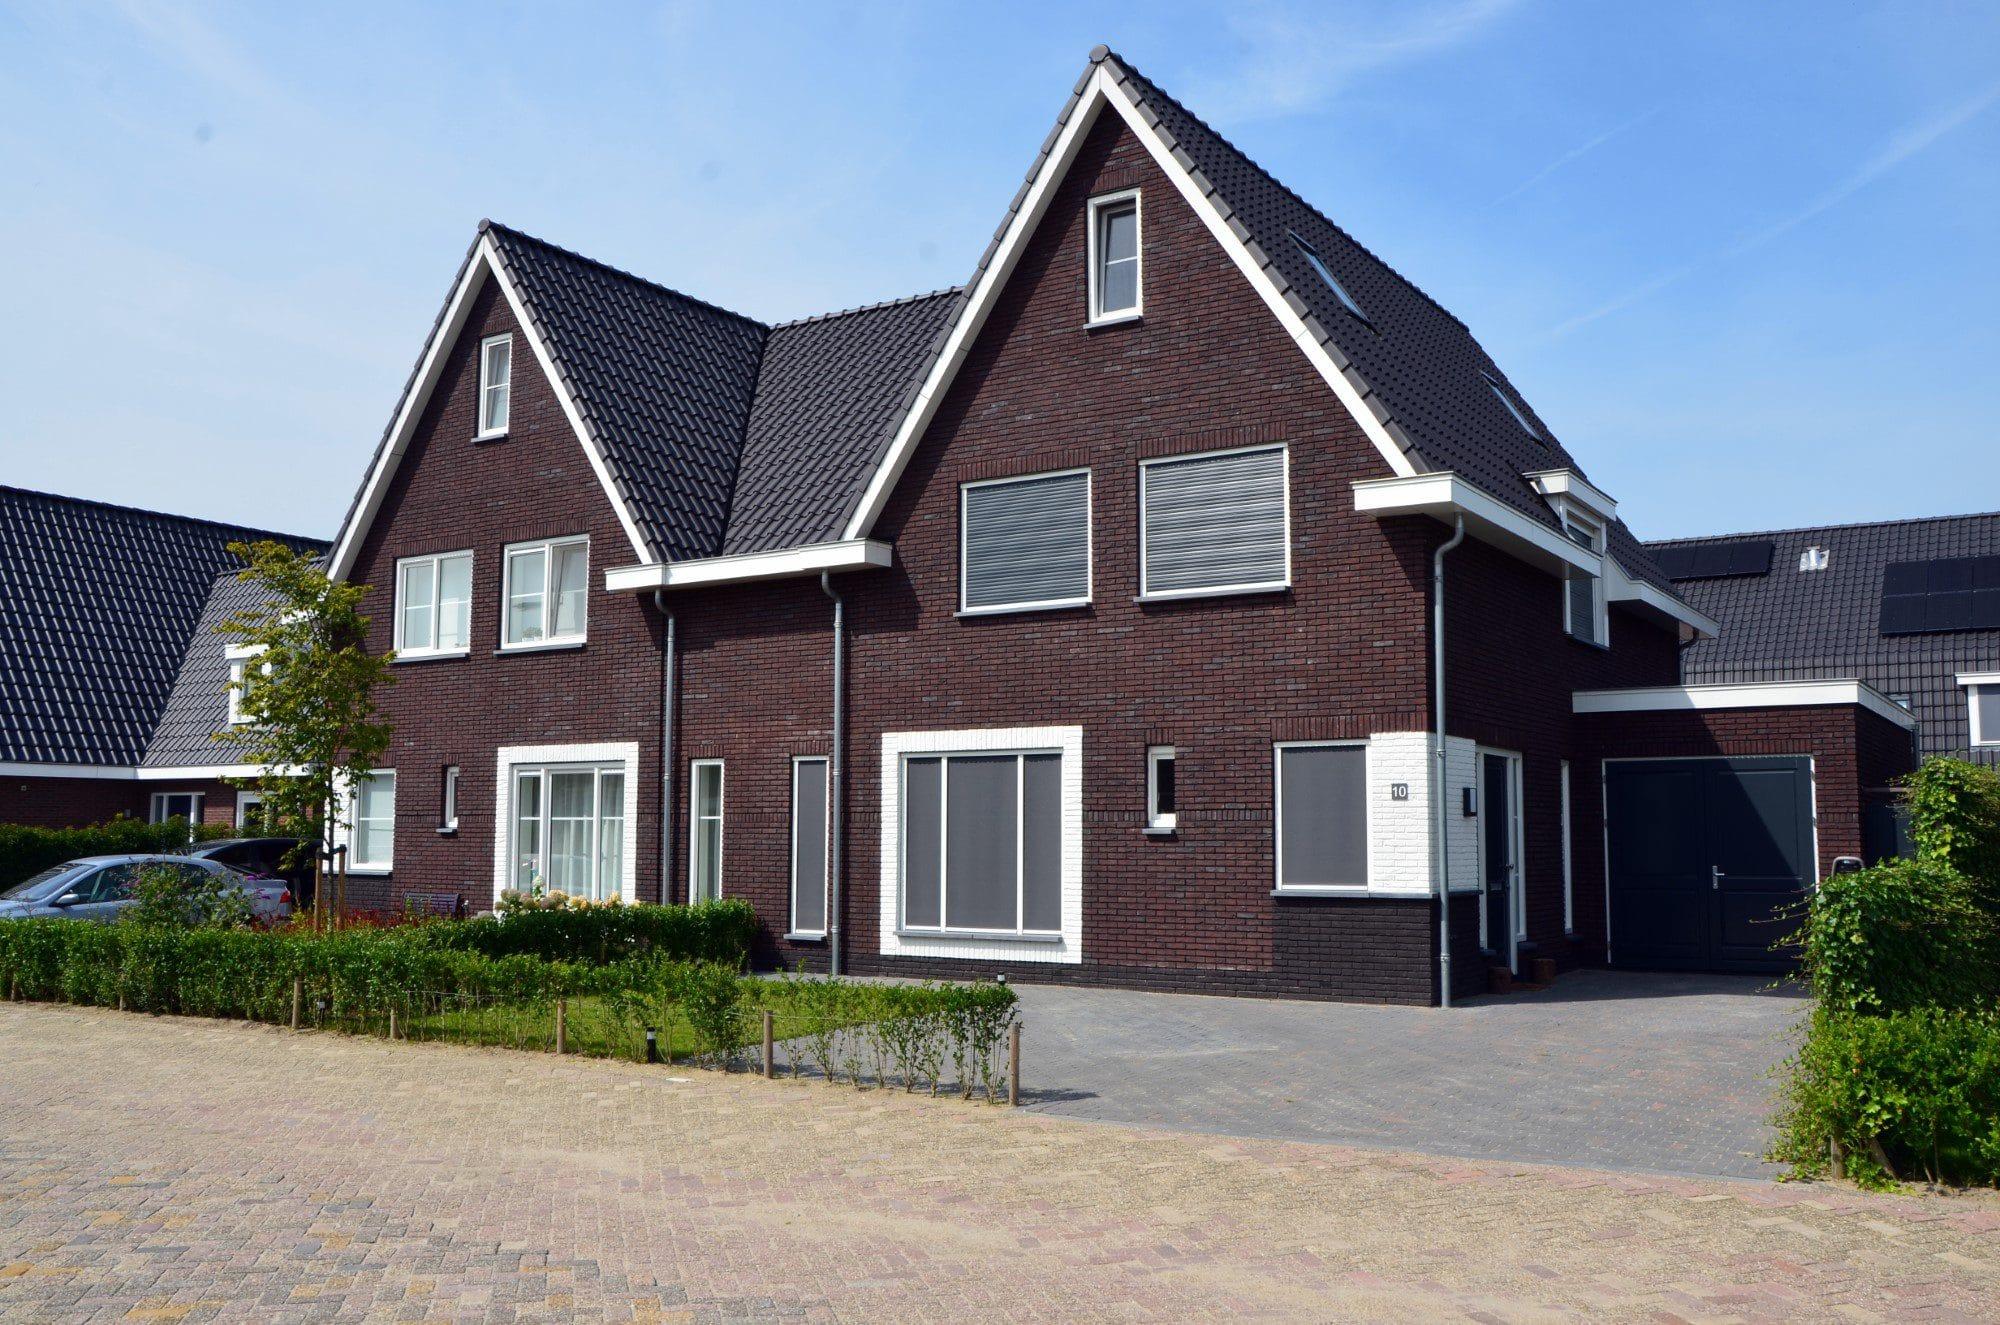 https://www.allurebouw.nl/inhoud/uploads/2-onder-1-kap-jaren-30.jpg